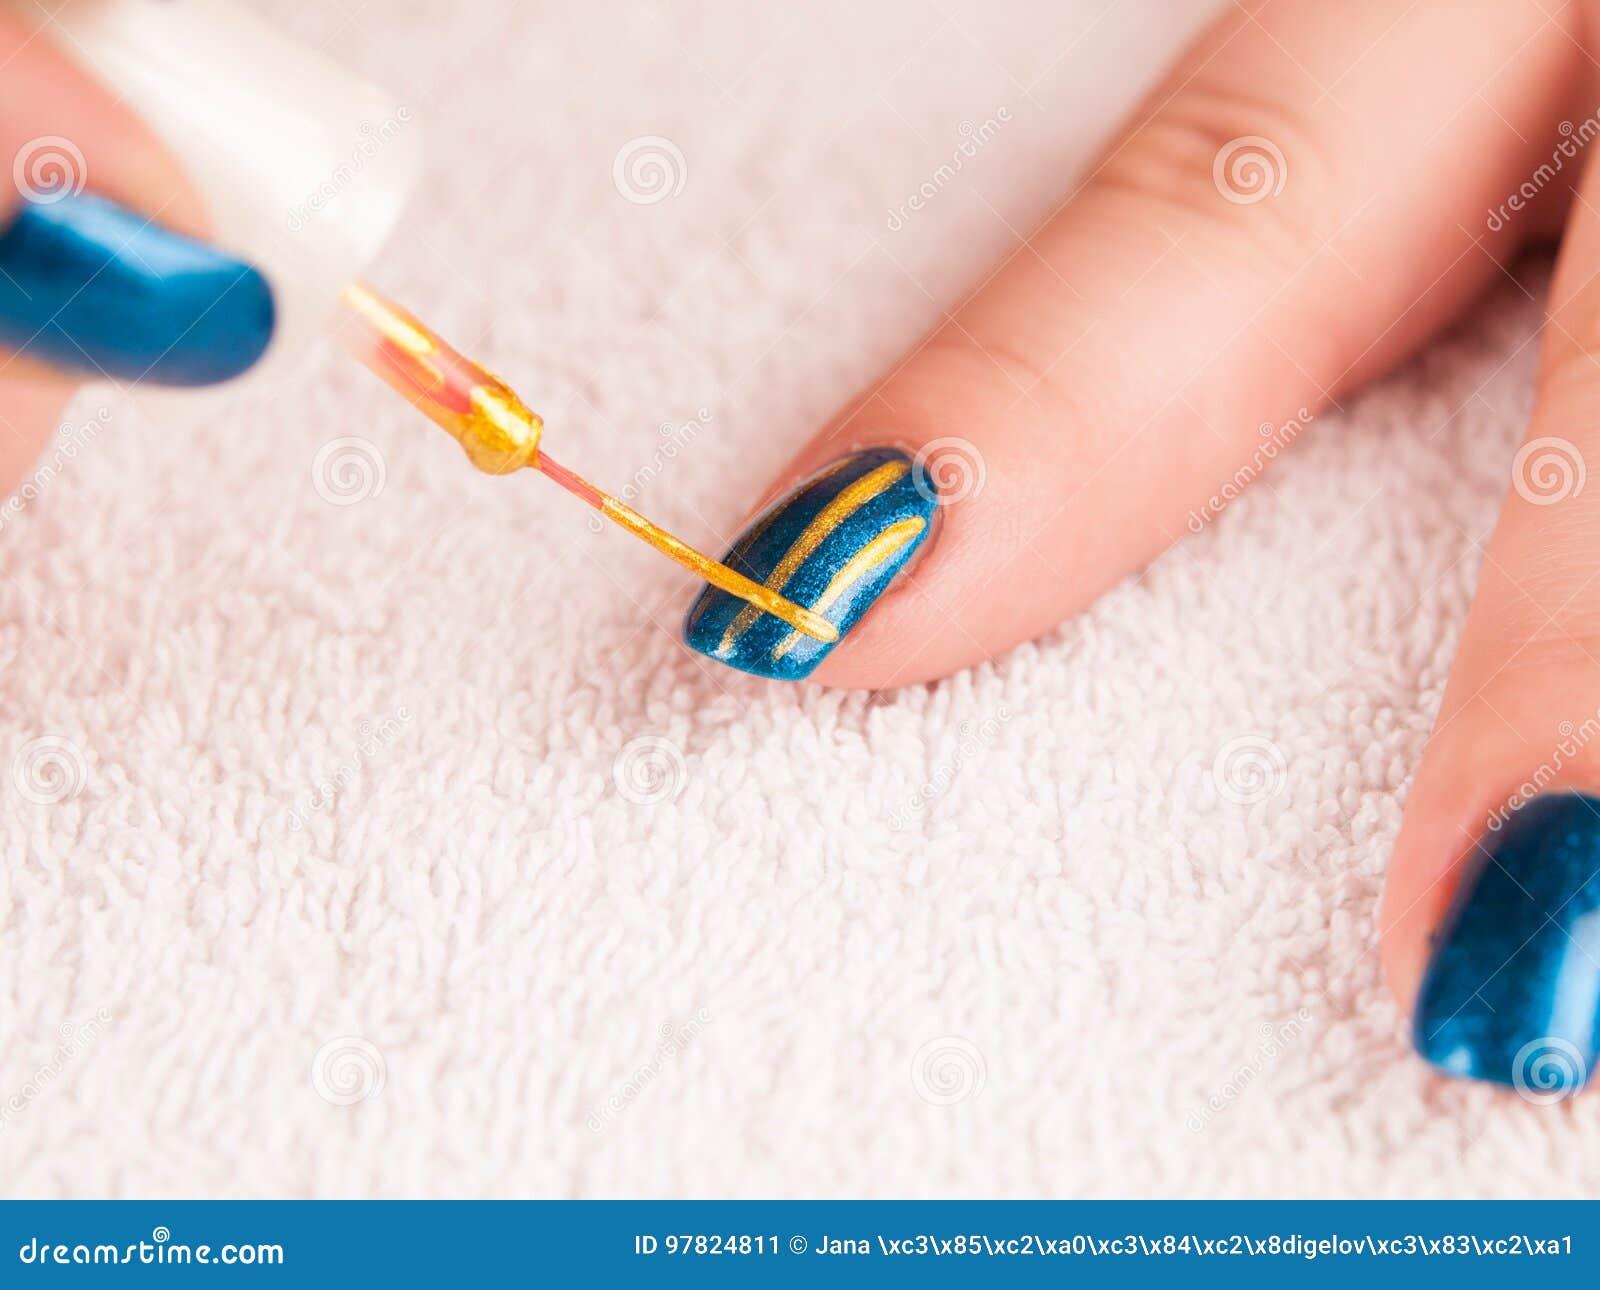 Nail art - painting gold stripes on dark blue base polish